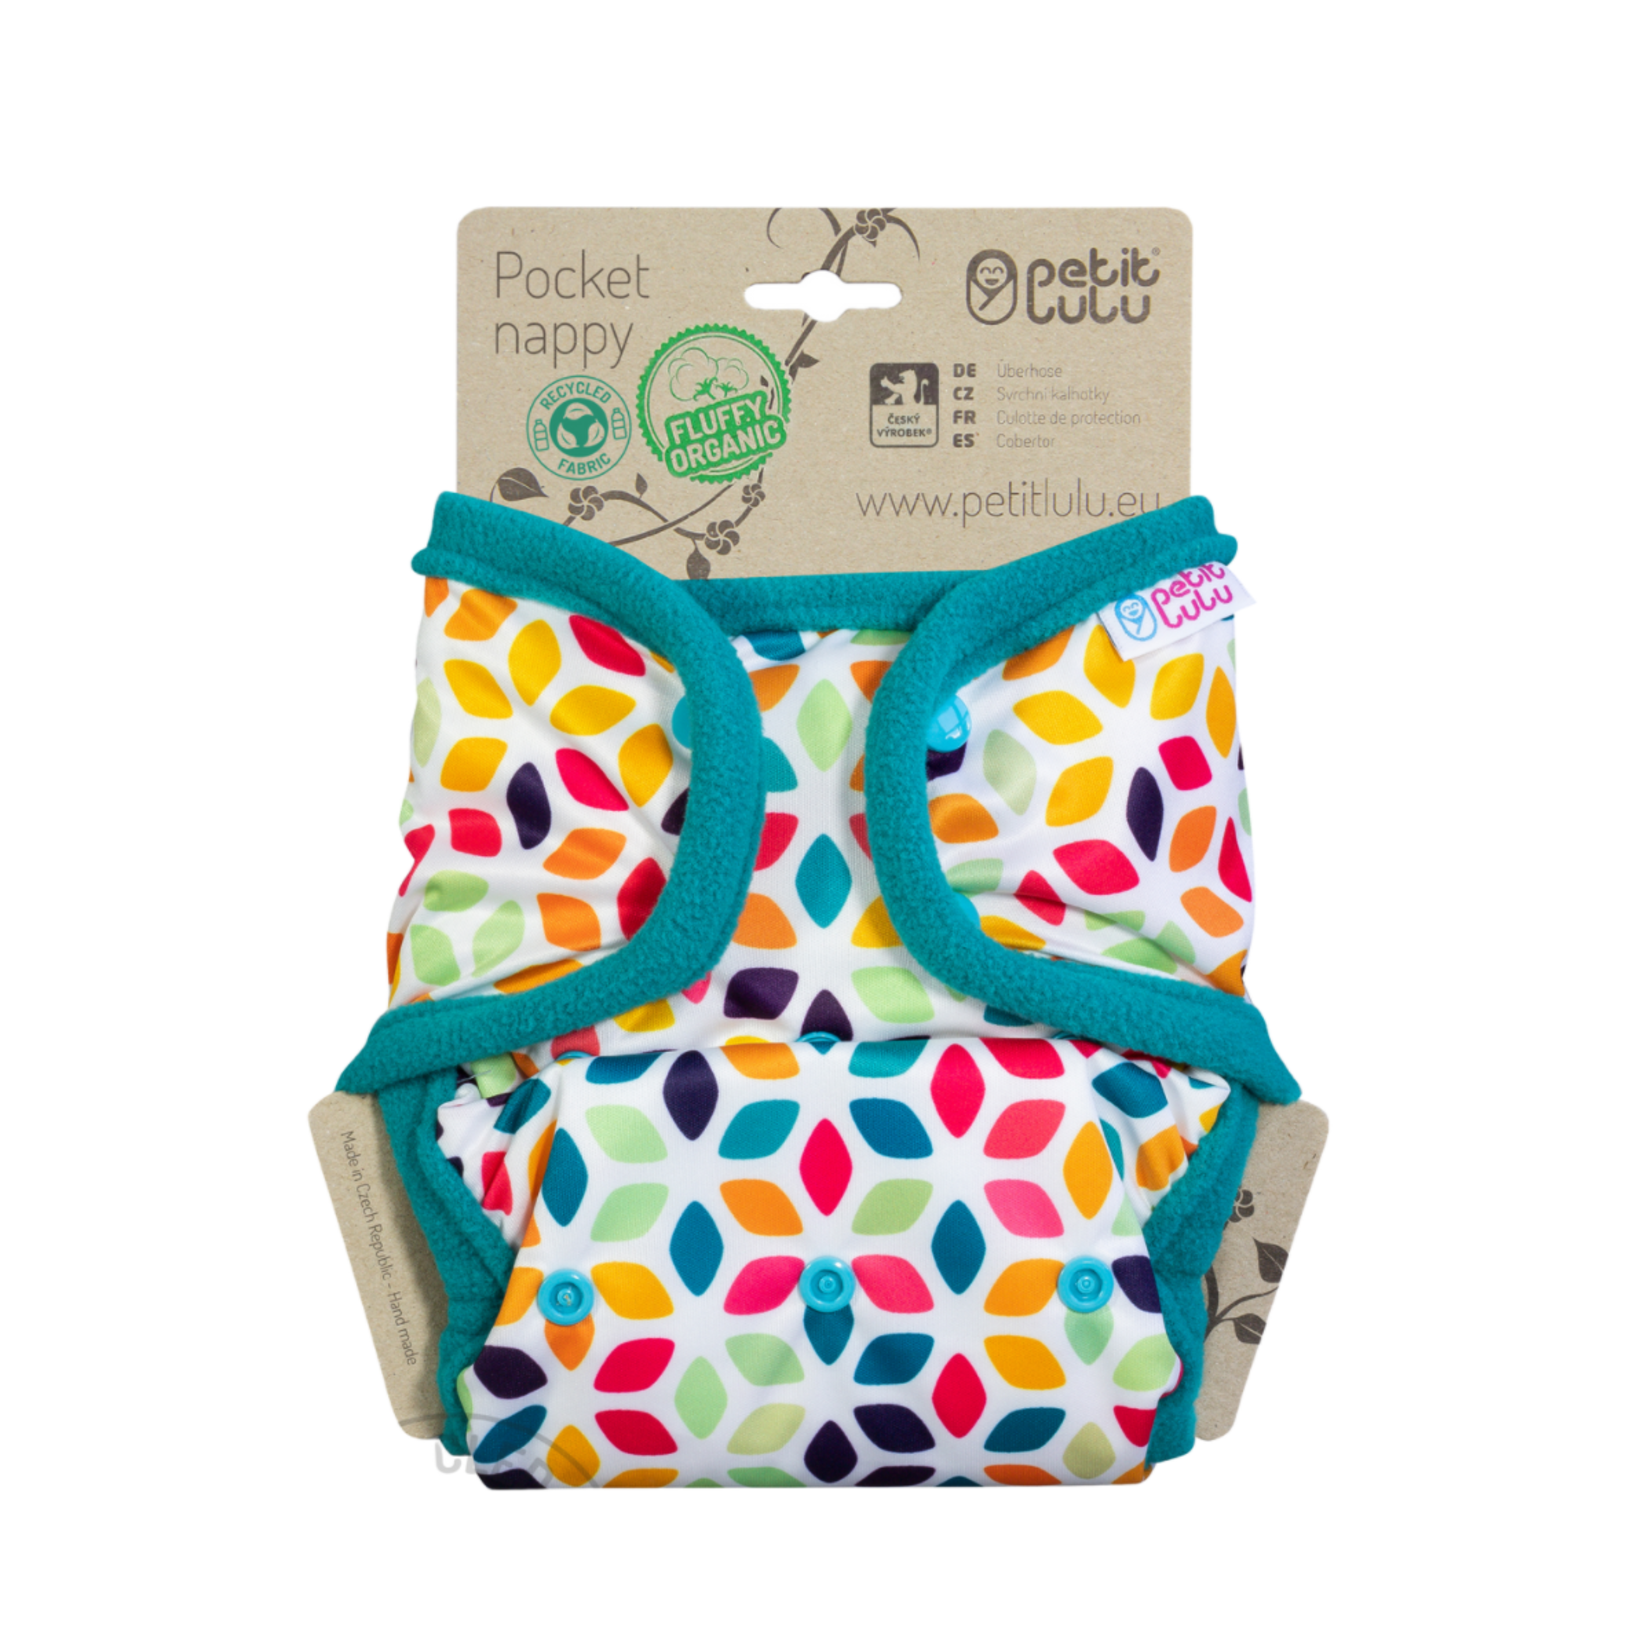 Petit Lulu Pocketluier (Floral Cubes) Snaps